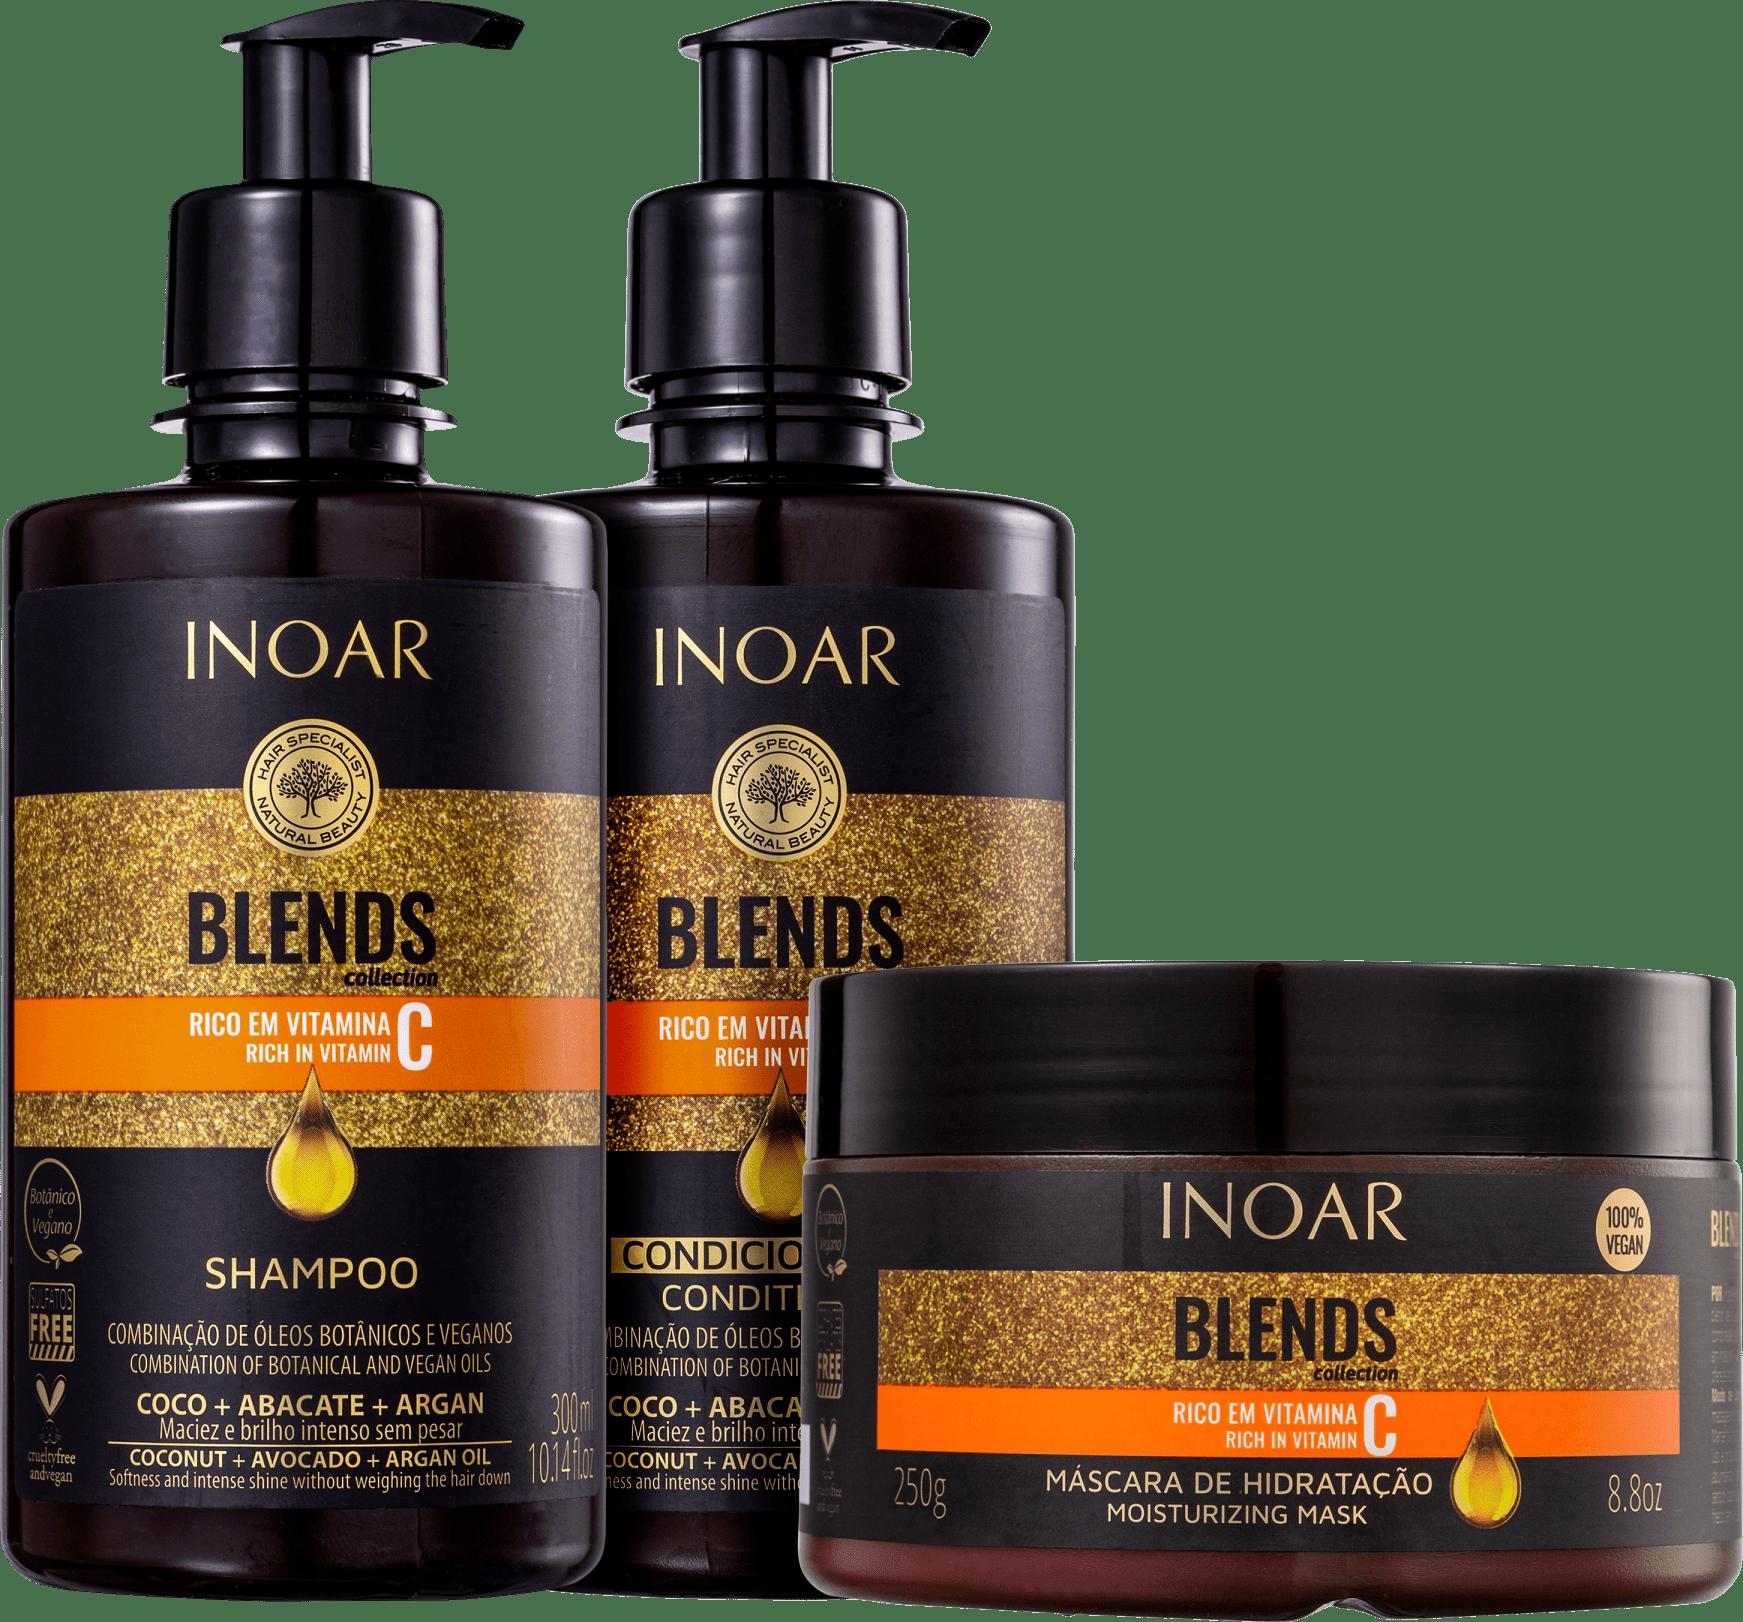 inoar blends  entretien lissage shampoing masque conditioner